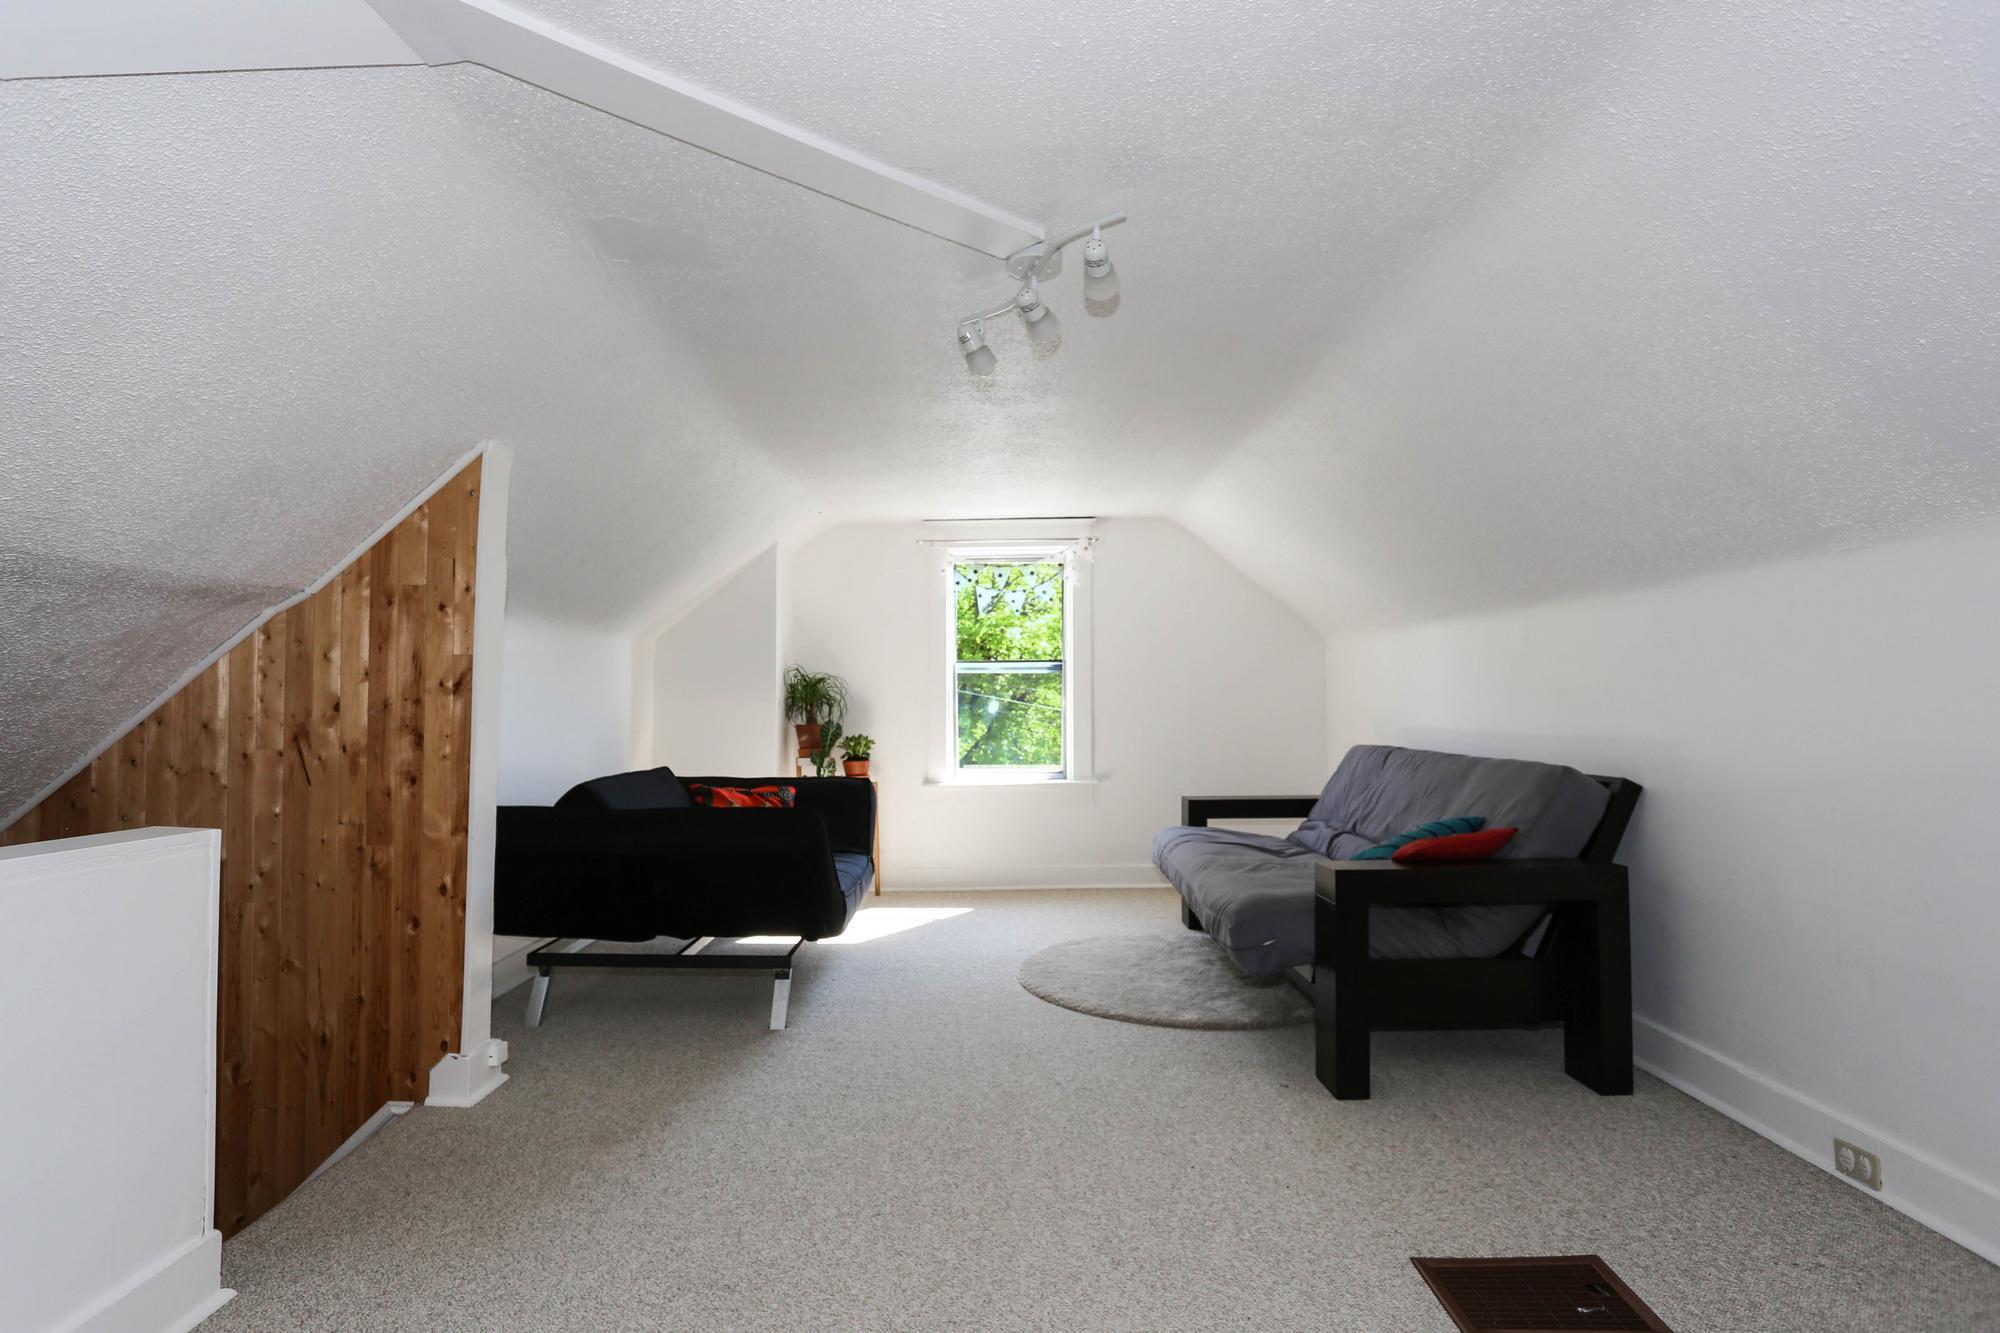 Photo 26: Photos: 105 Evanson Street in Winnipeg: Wolseley Single Family Detached for sale (5B)  : MLS®# 1821900